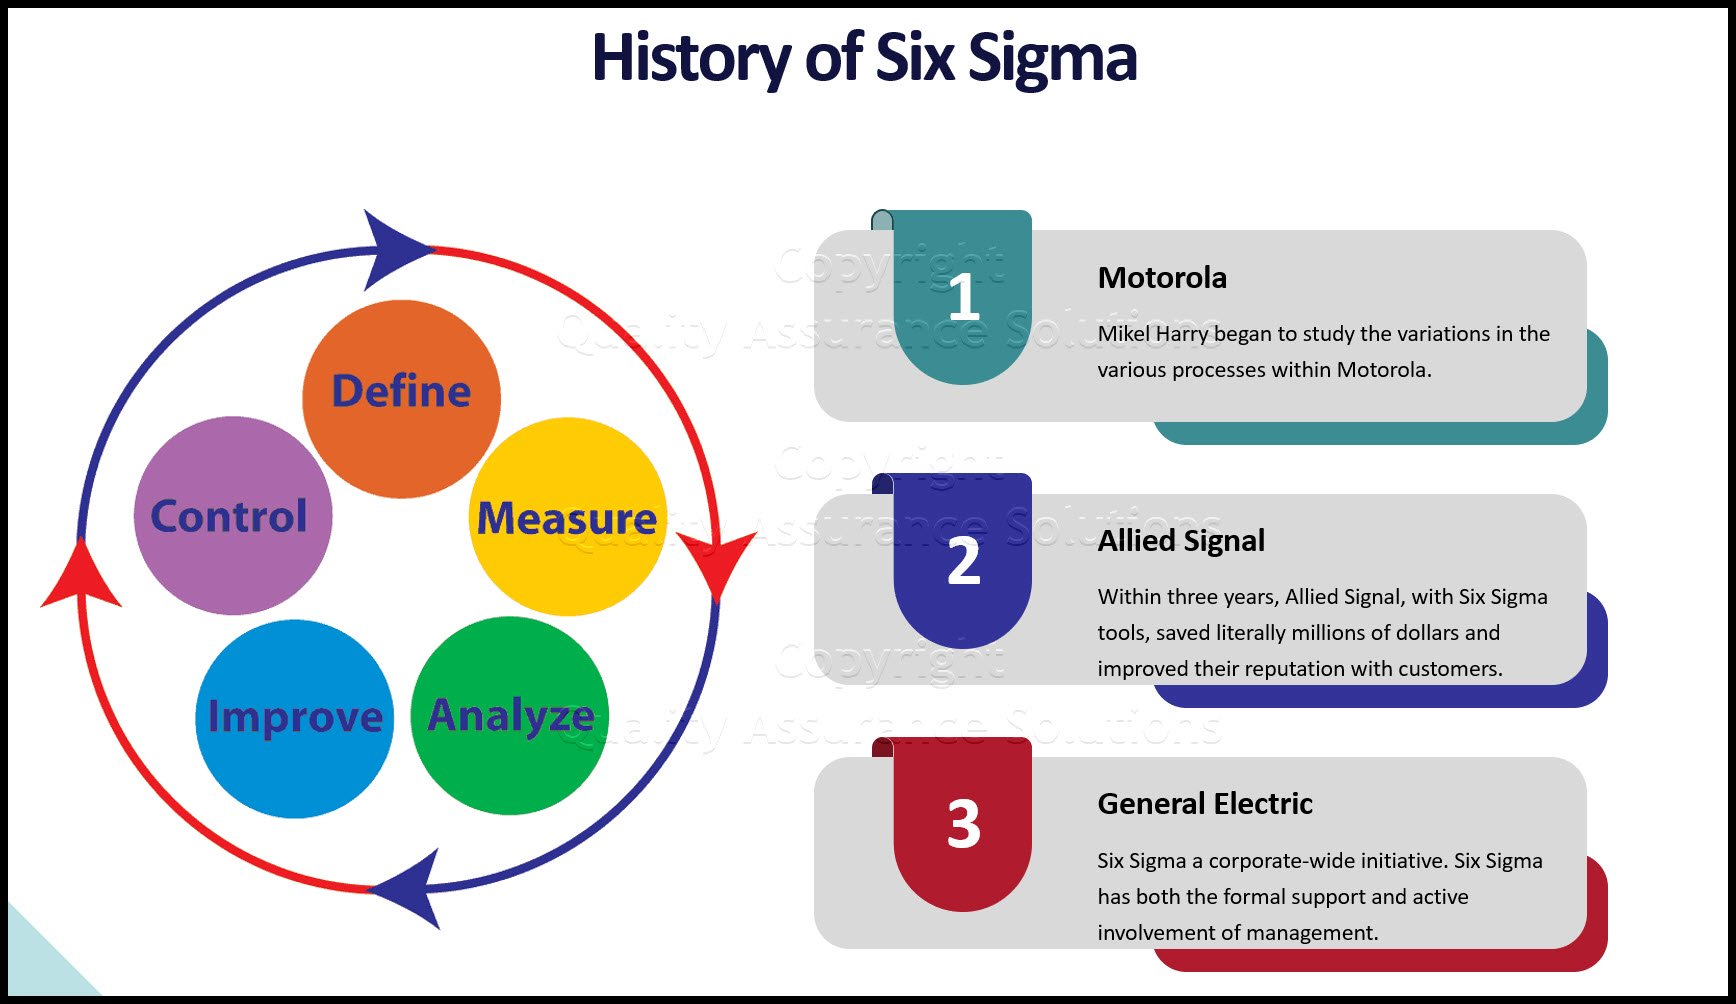 History of Six Sigma business slide